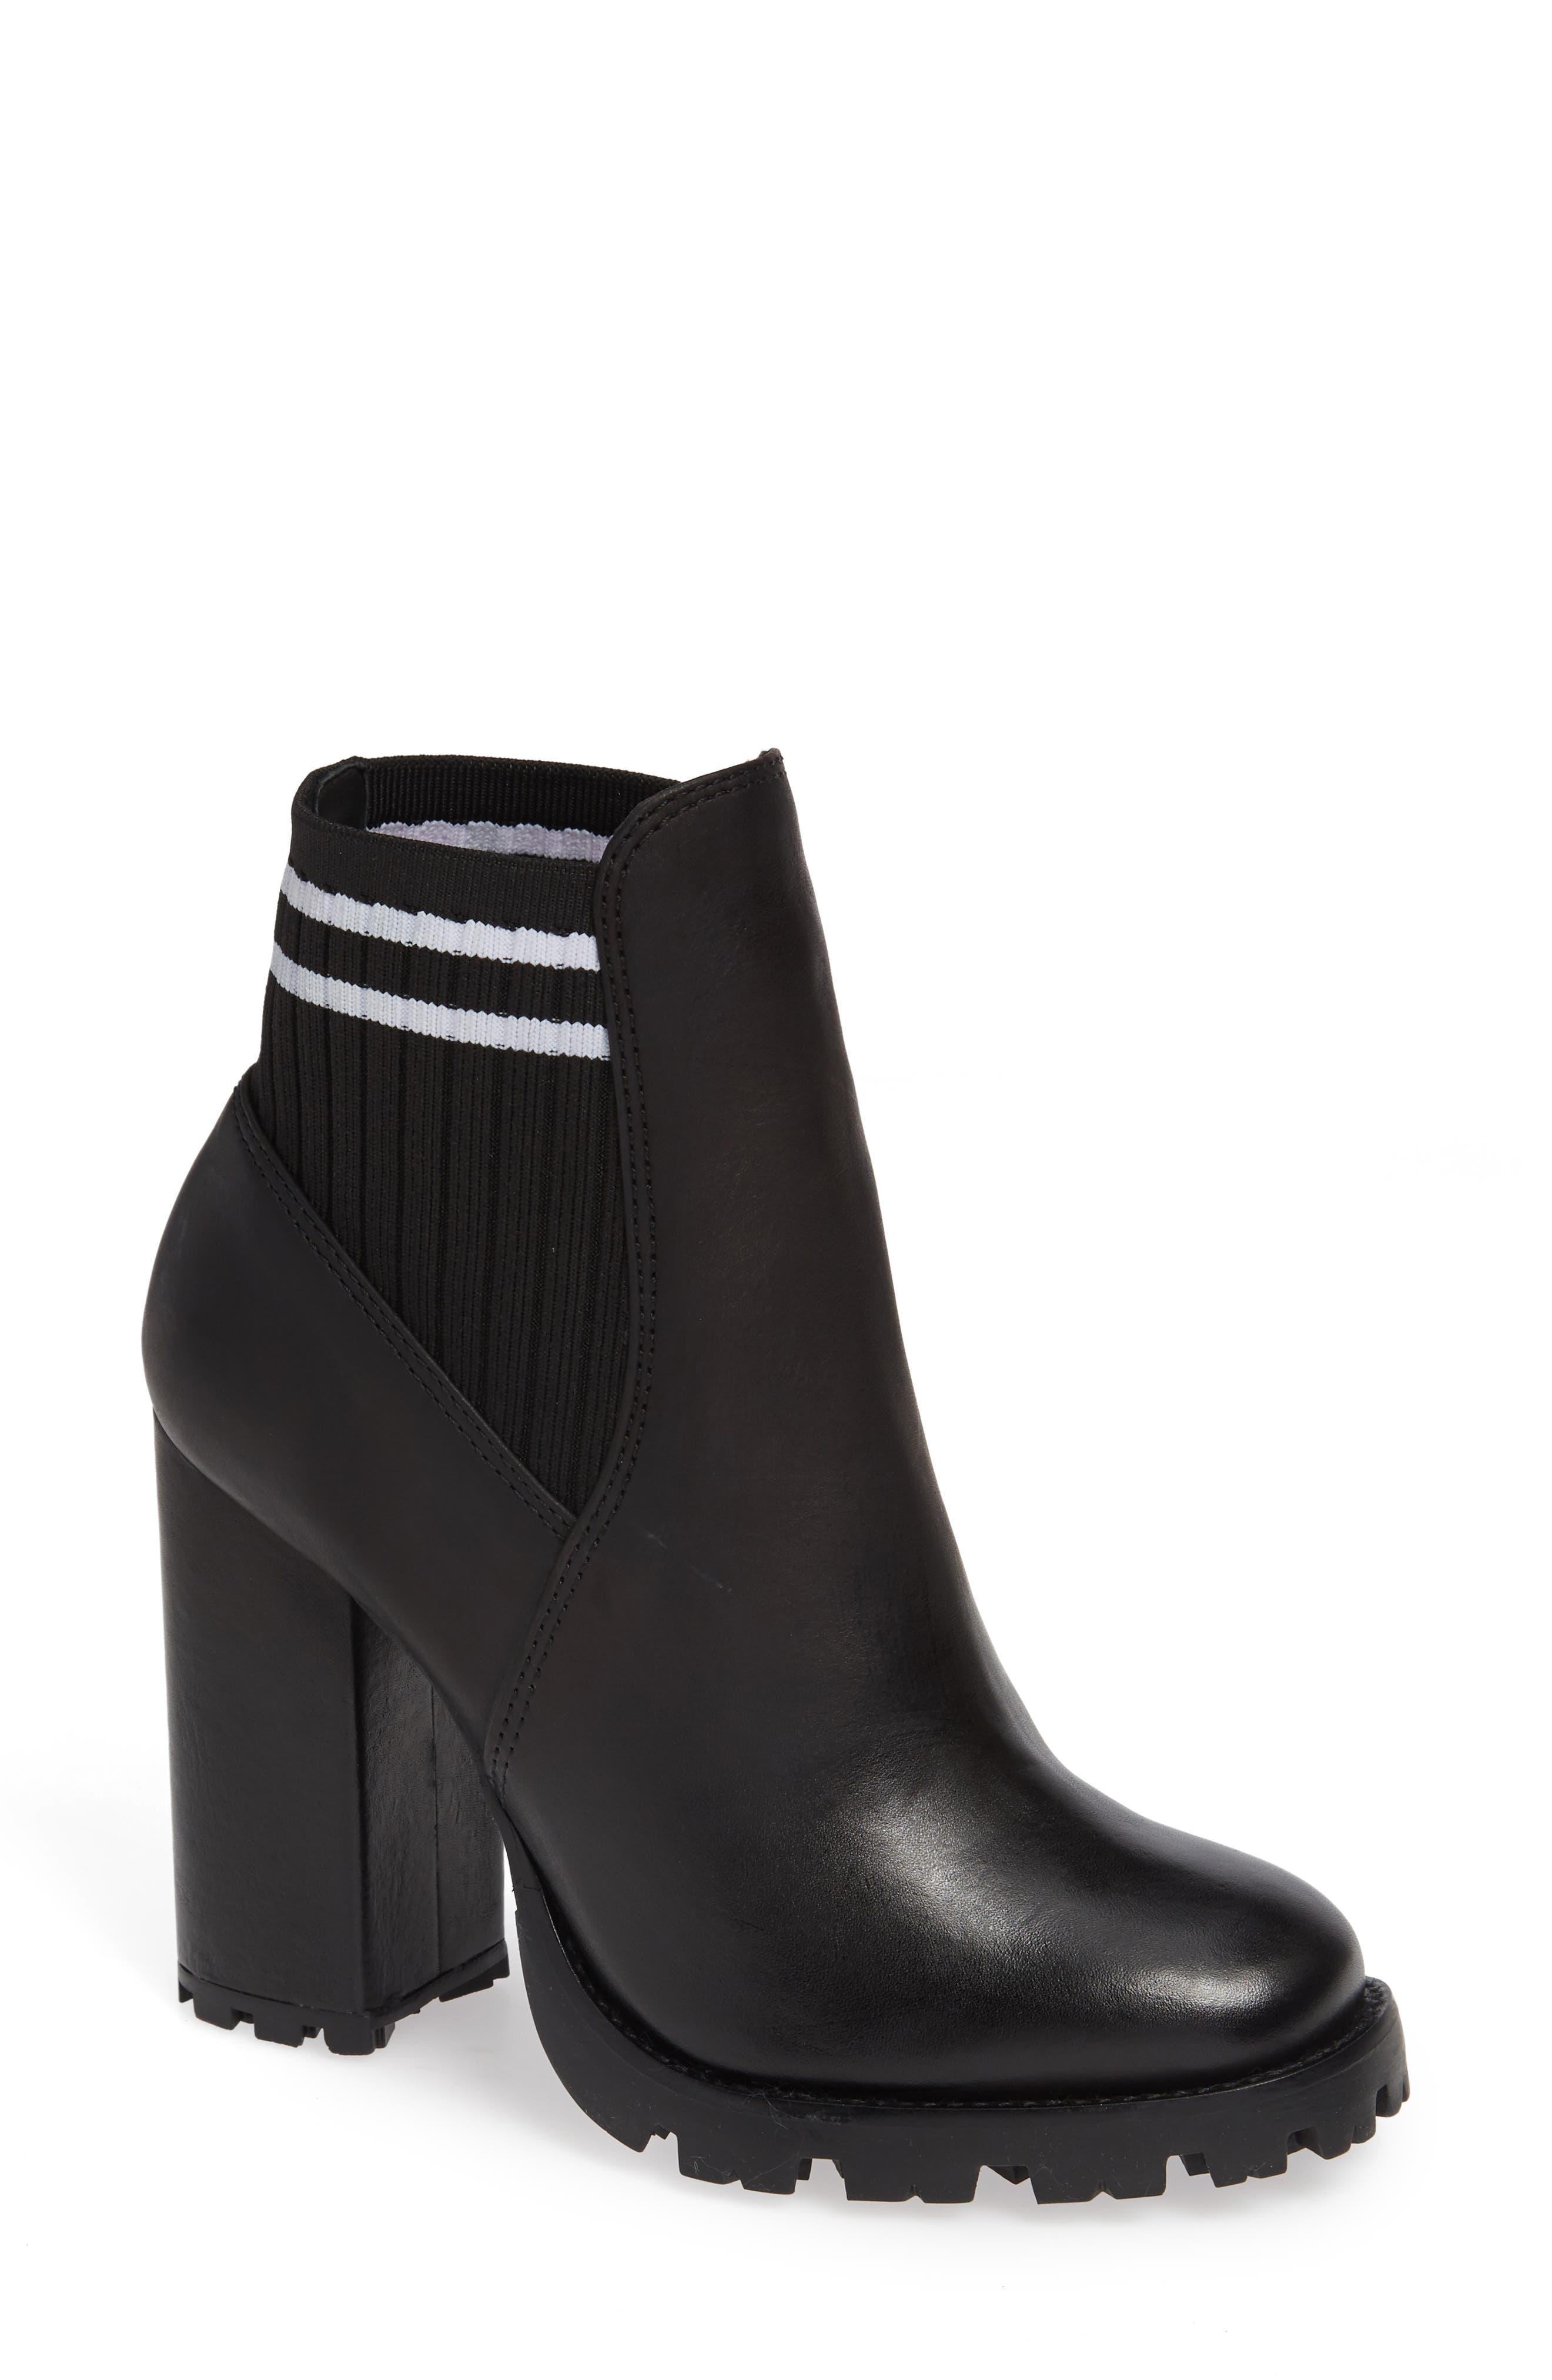 Ilenne Platform Sock Bootie,                         Main,                         color, BLACK/ WHITE